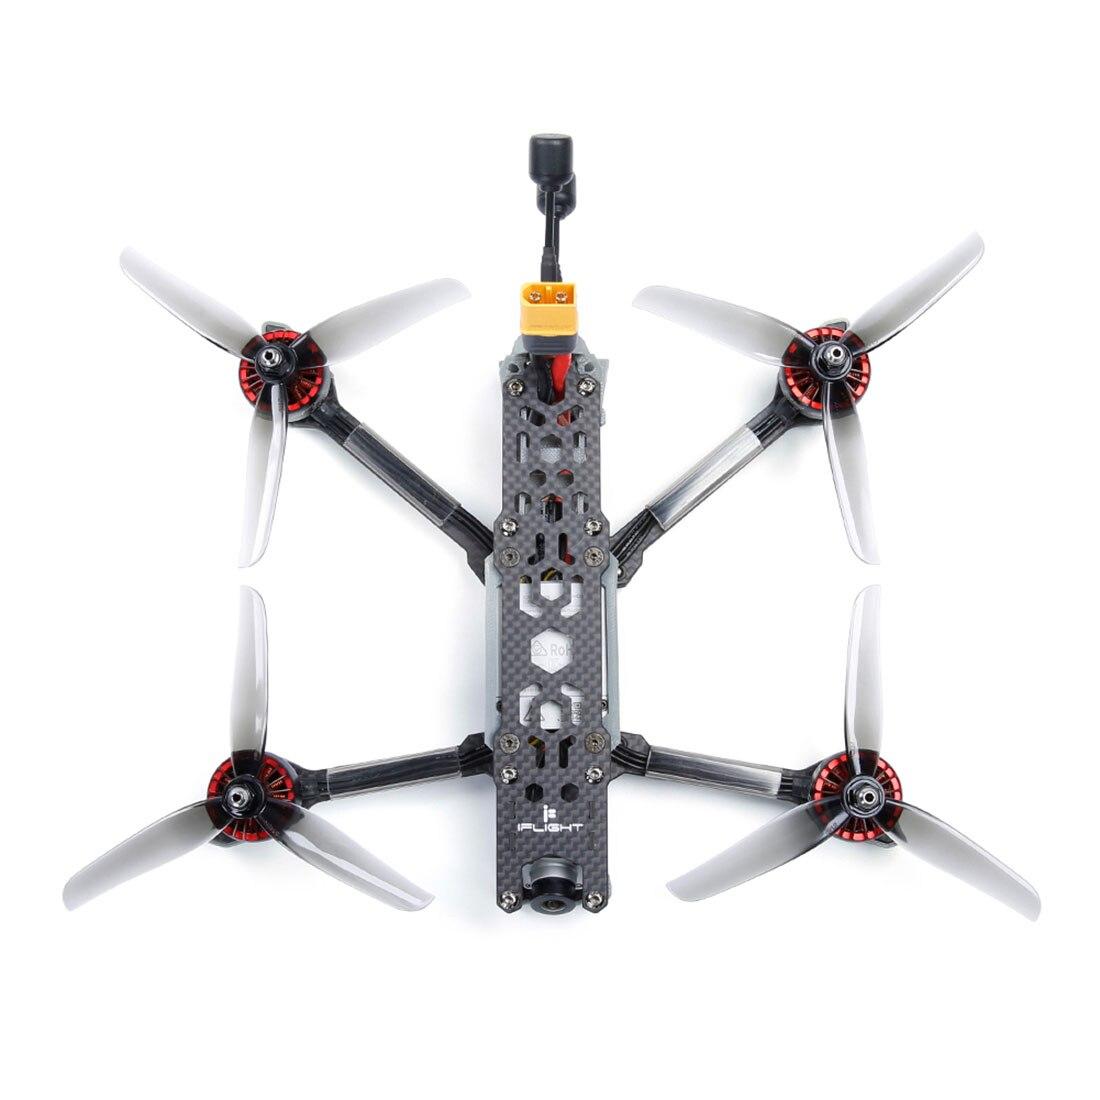 IFlight TITAN DC5 5 zoll 222mm 4 s/6 s HD FPV Racing Drone BNF SucceX D f7 50A Stapel XING E 2207 2450/1800KV Motor Hubschrauber Spielzeug - 5